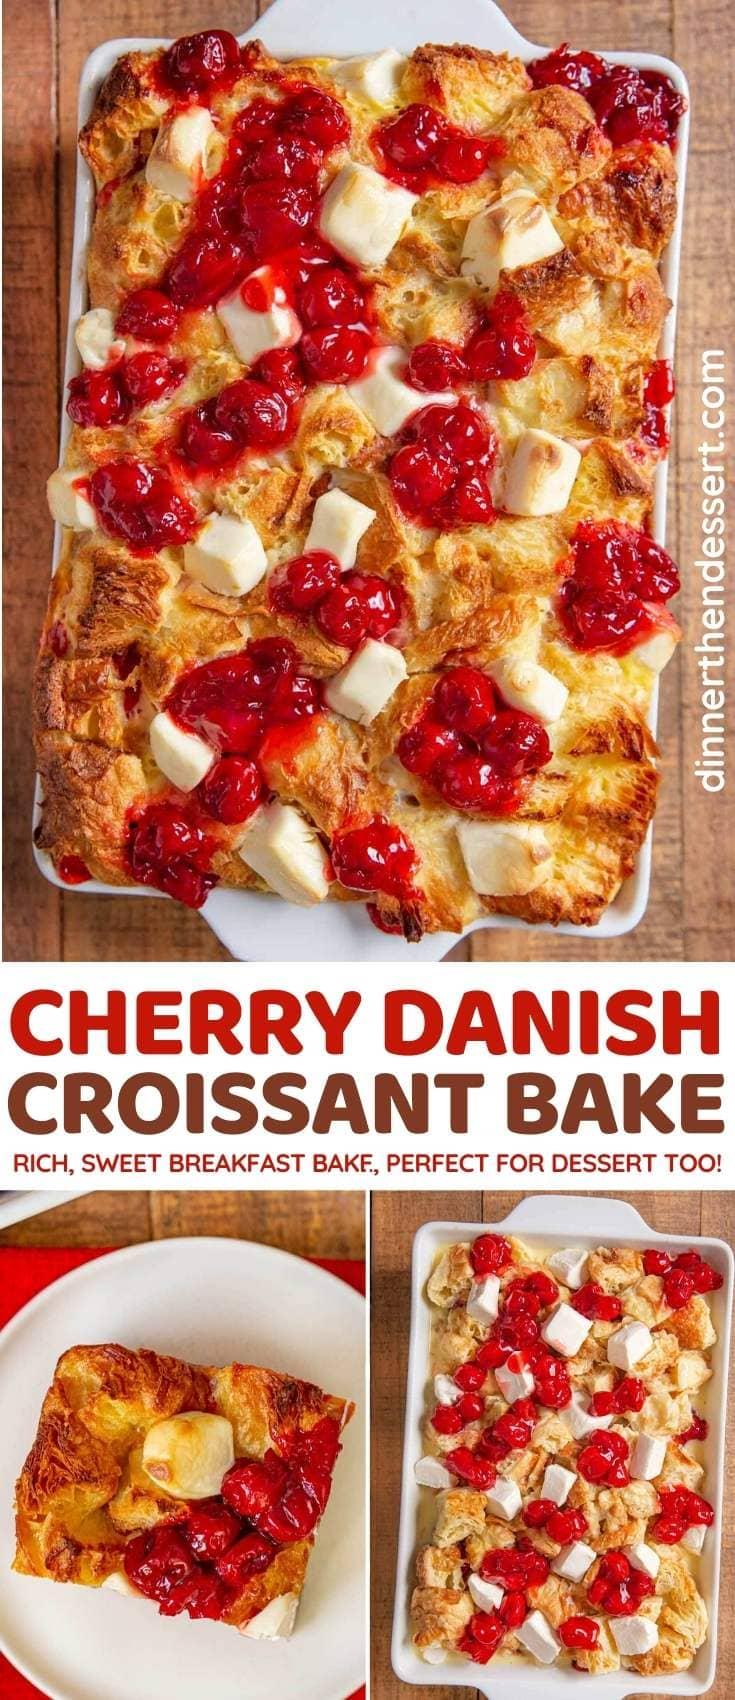 Cherry Danish Croissant Bake collage